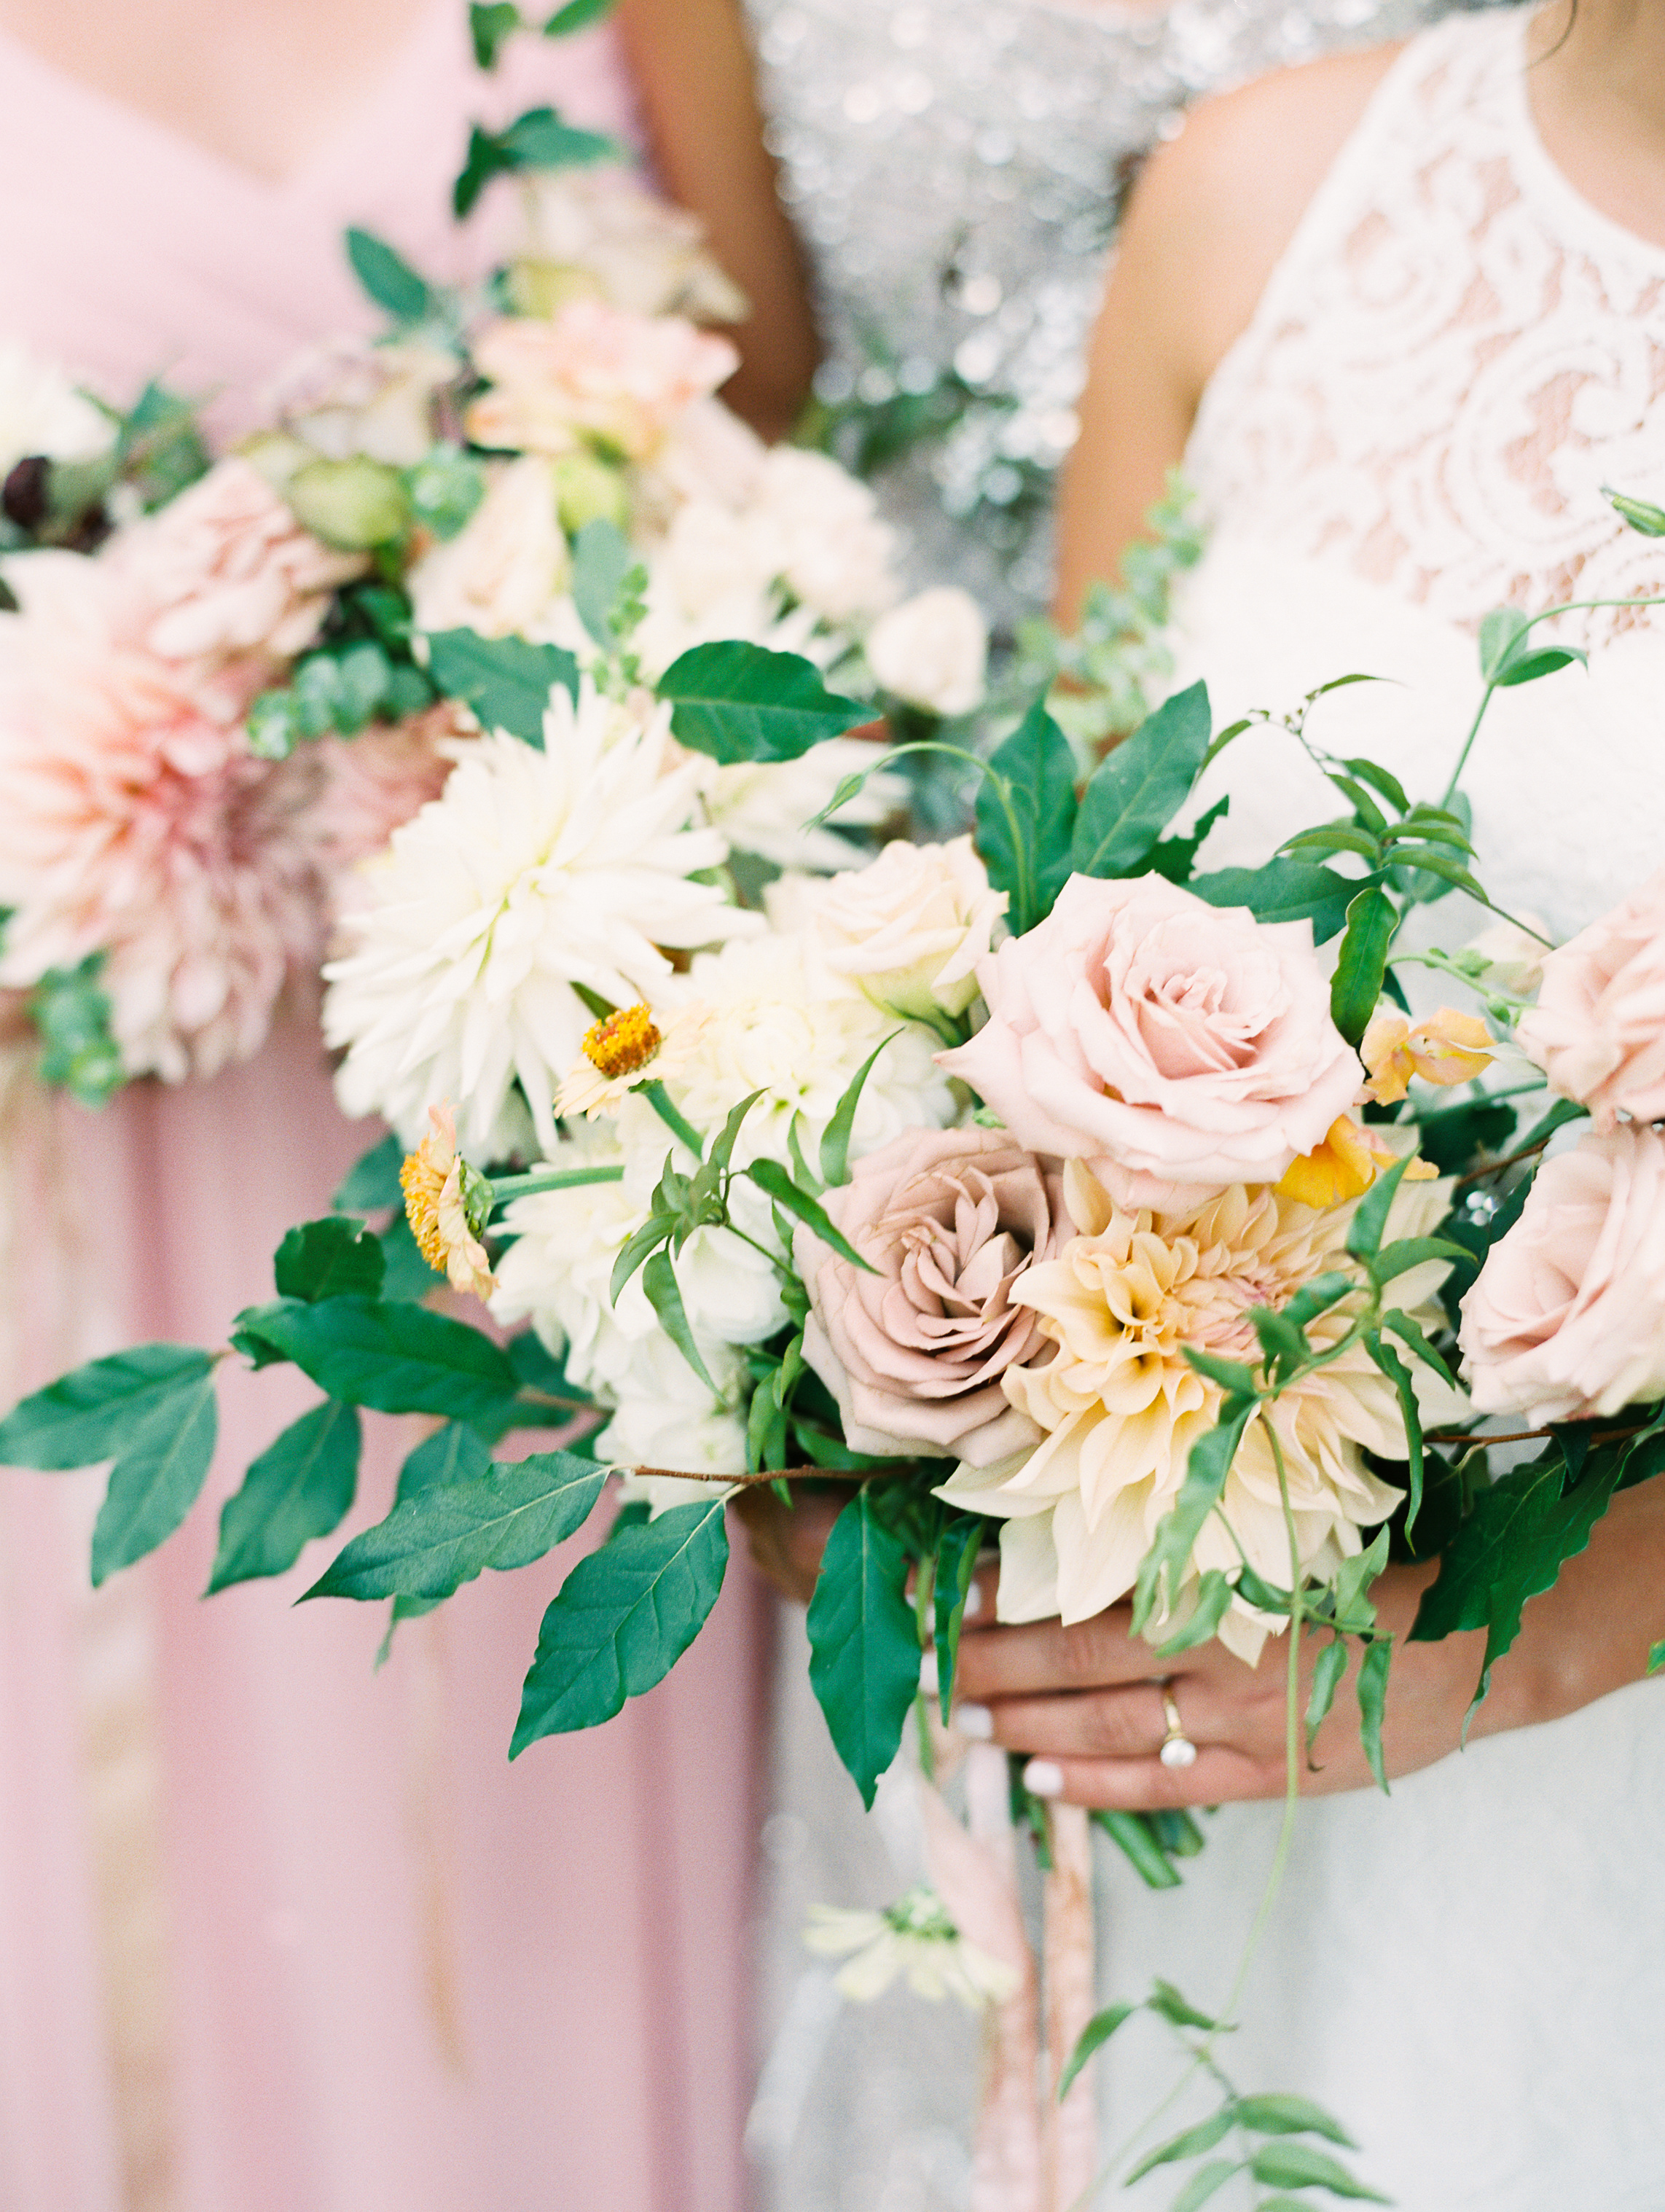 Zoller+Wedding+Bridal+Partyf-91.jpg